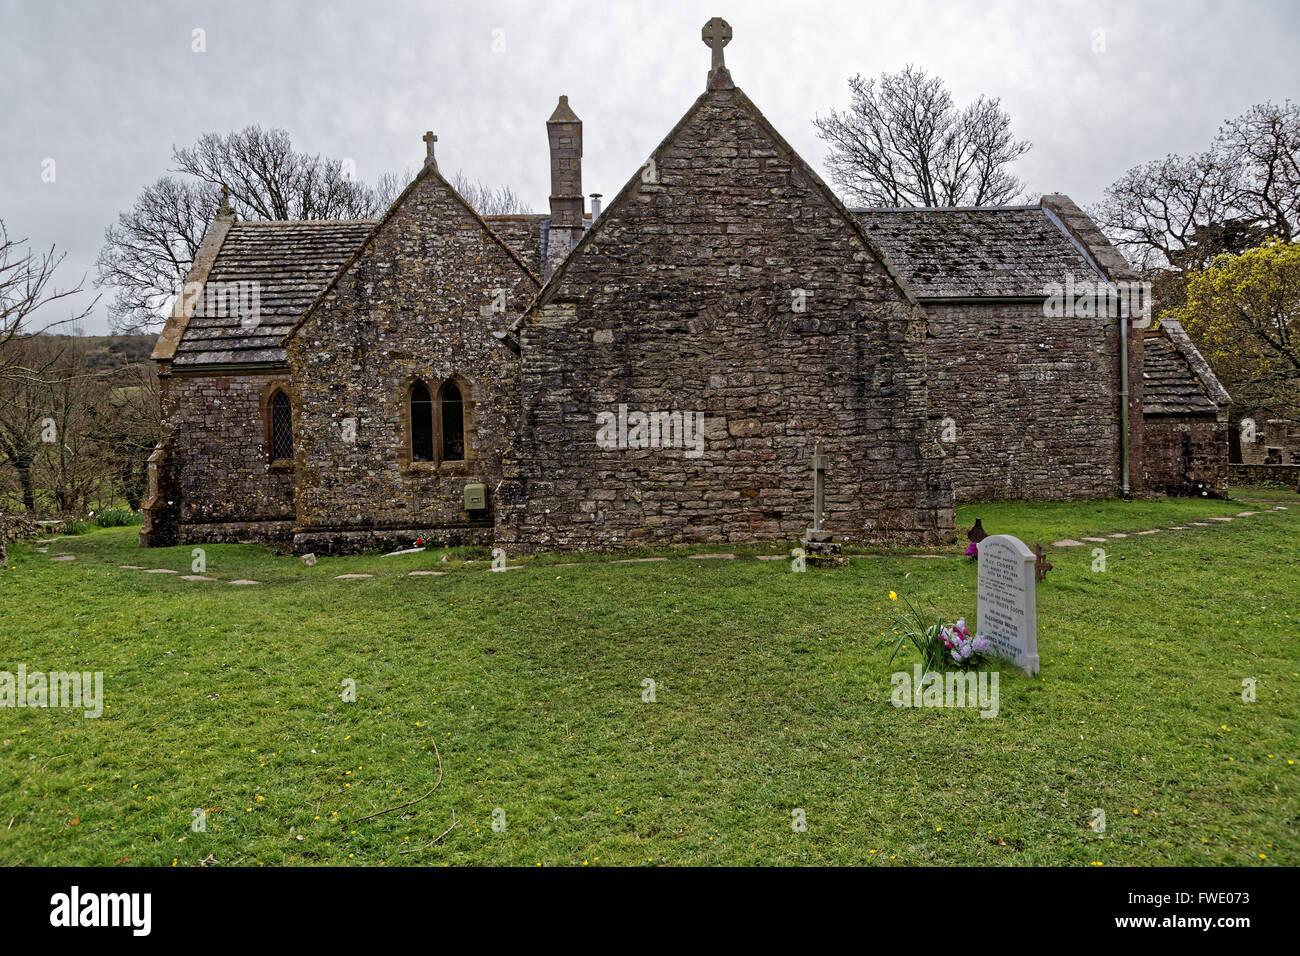 St Mary's church Tyneham village - Stock Image